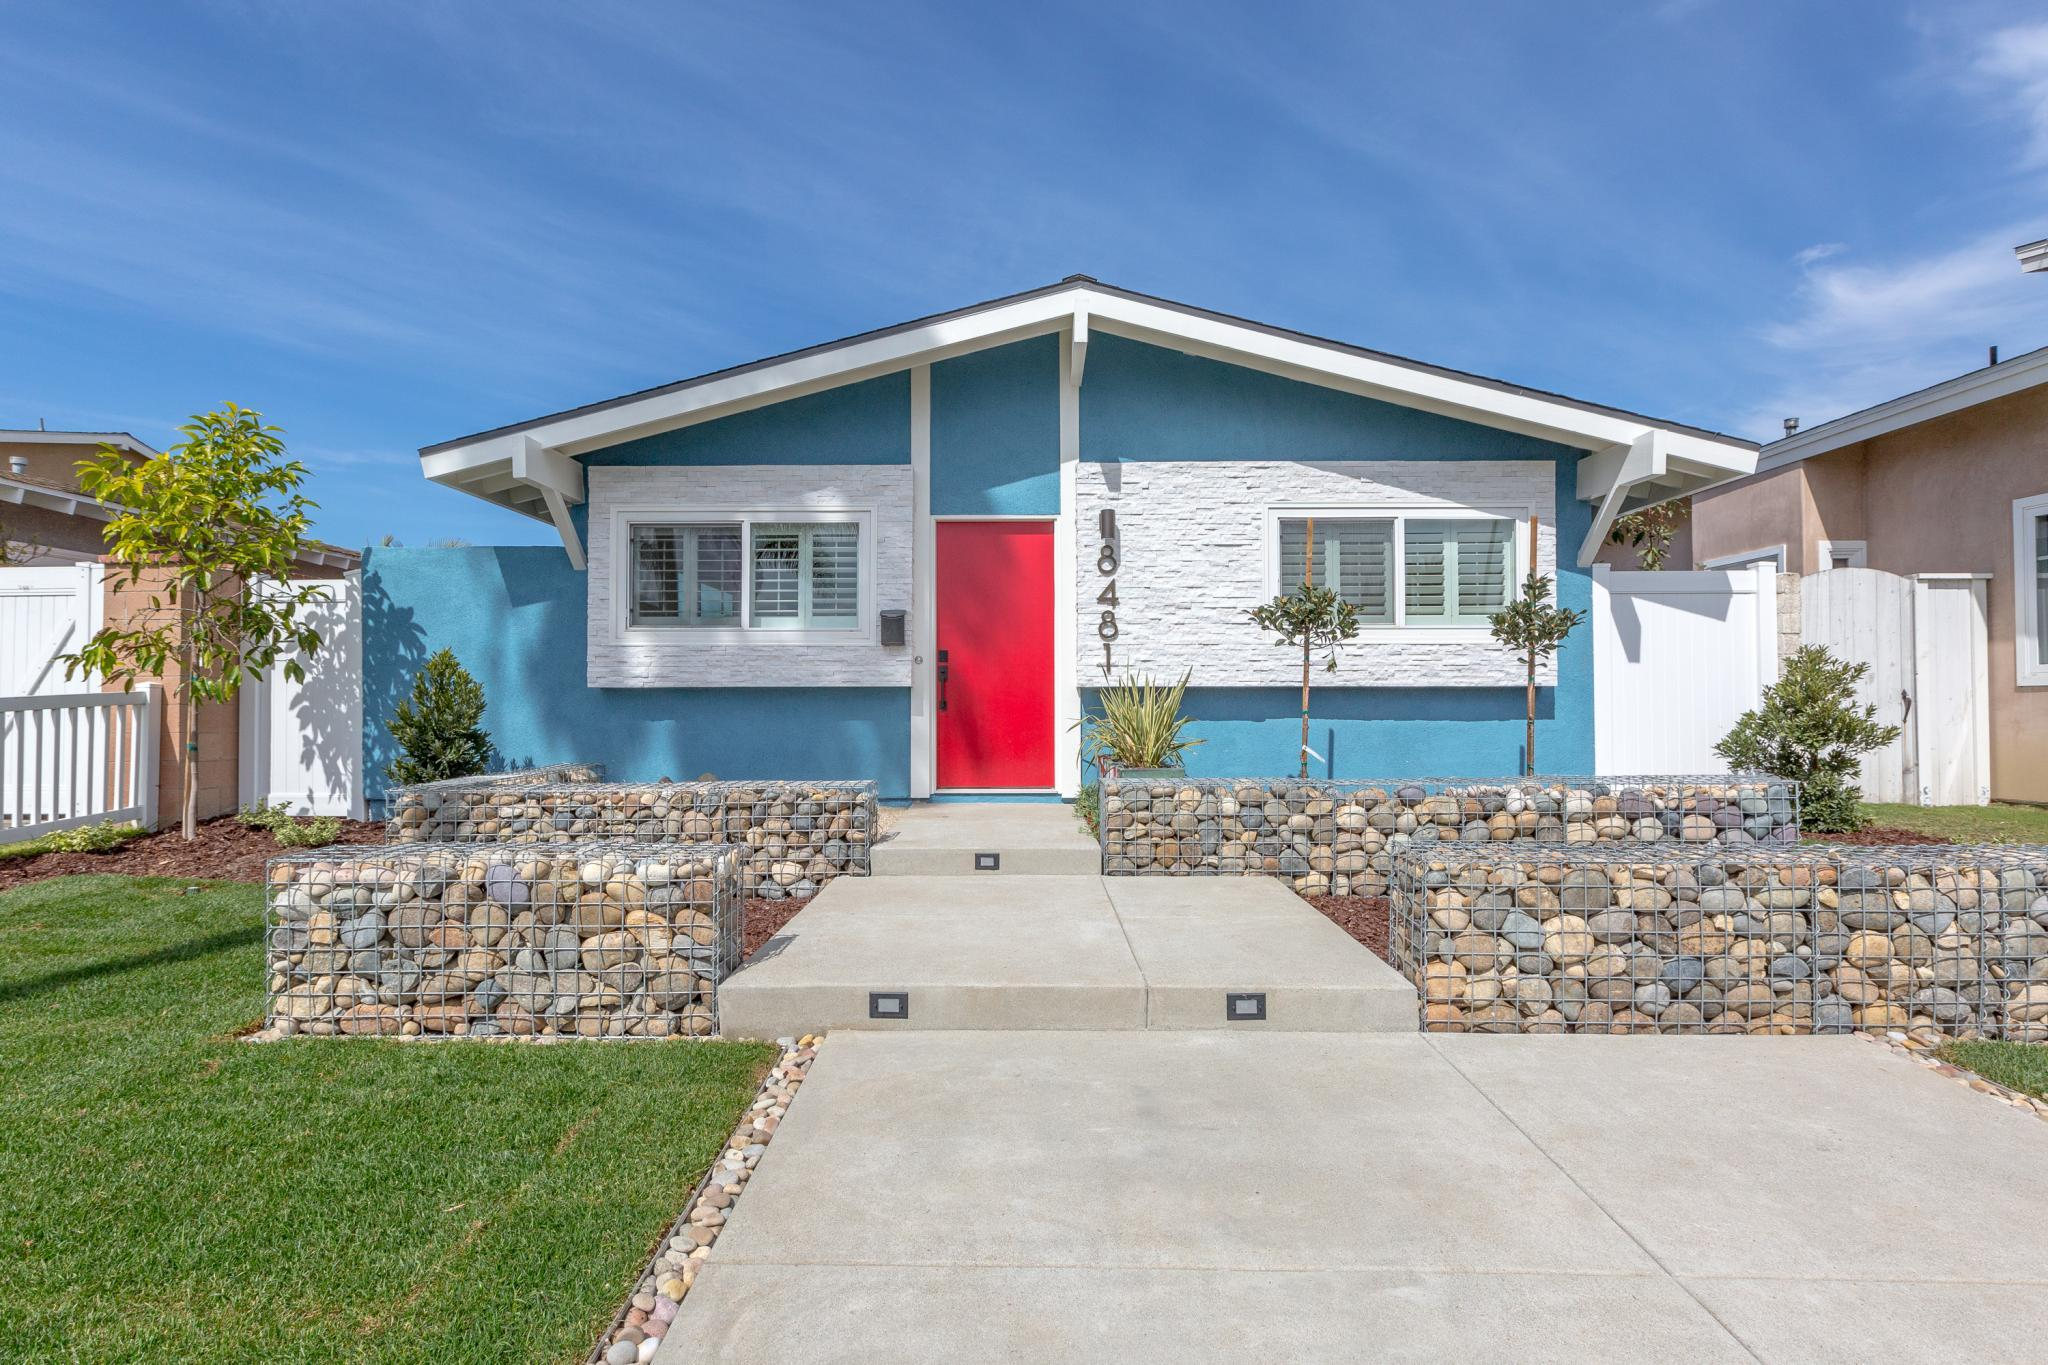 8481 Doncaster Dr For Rent - Huntington Beach, CA | Trulia